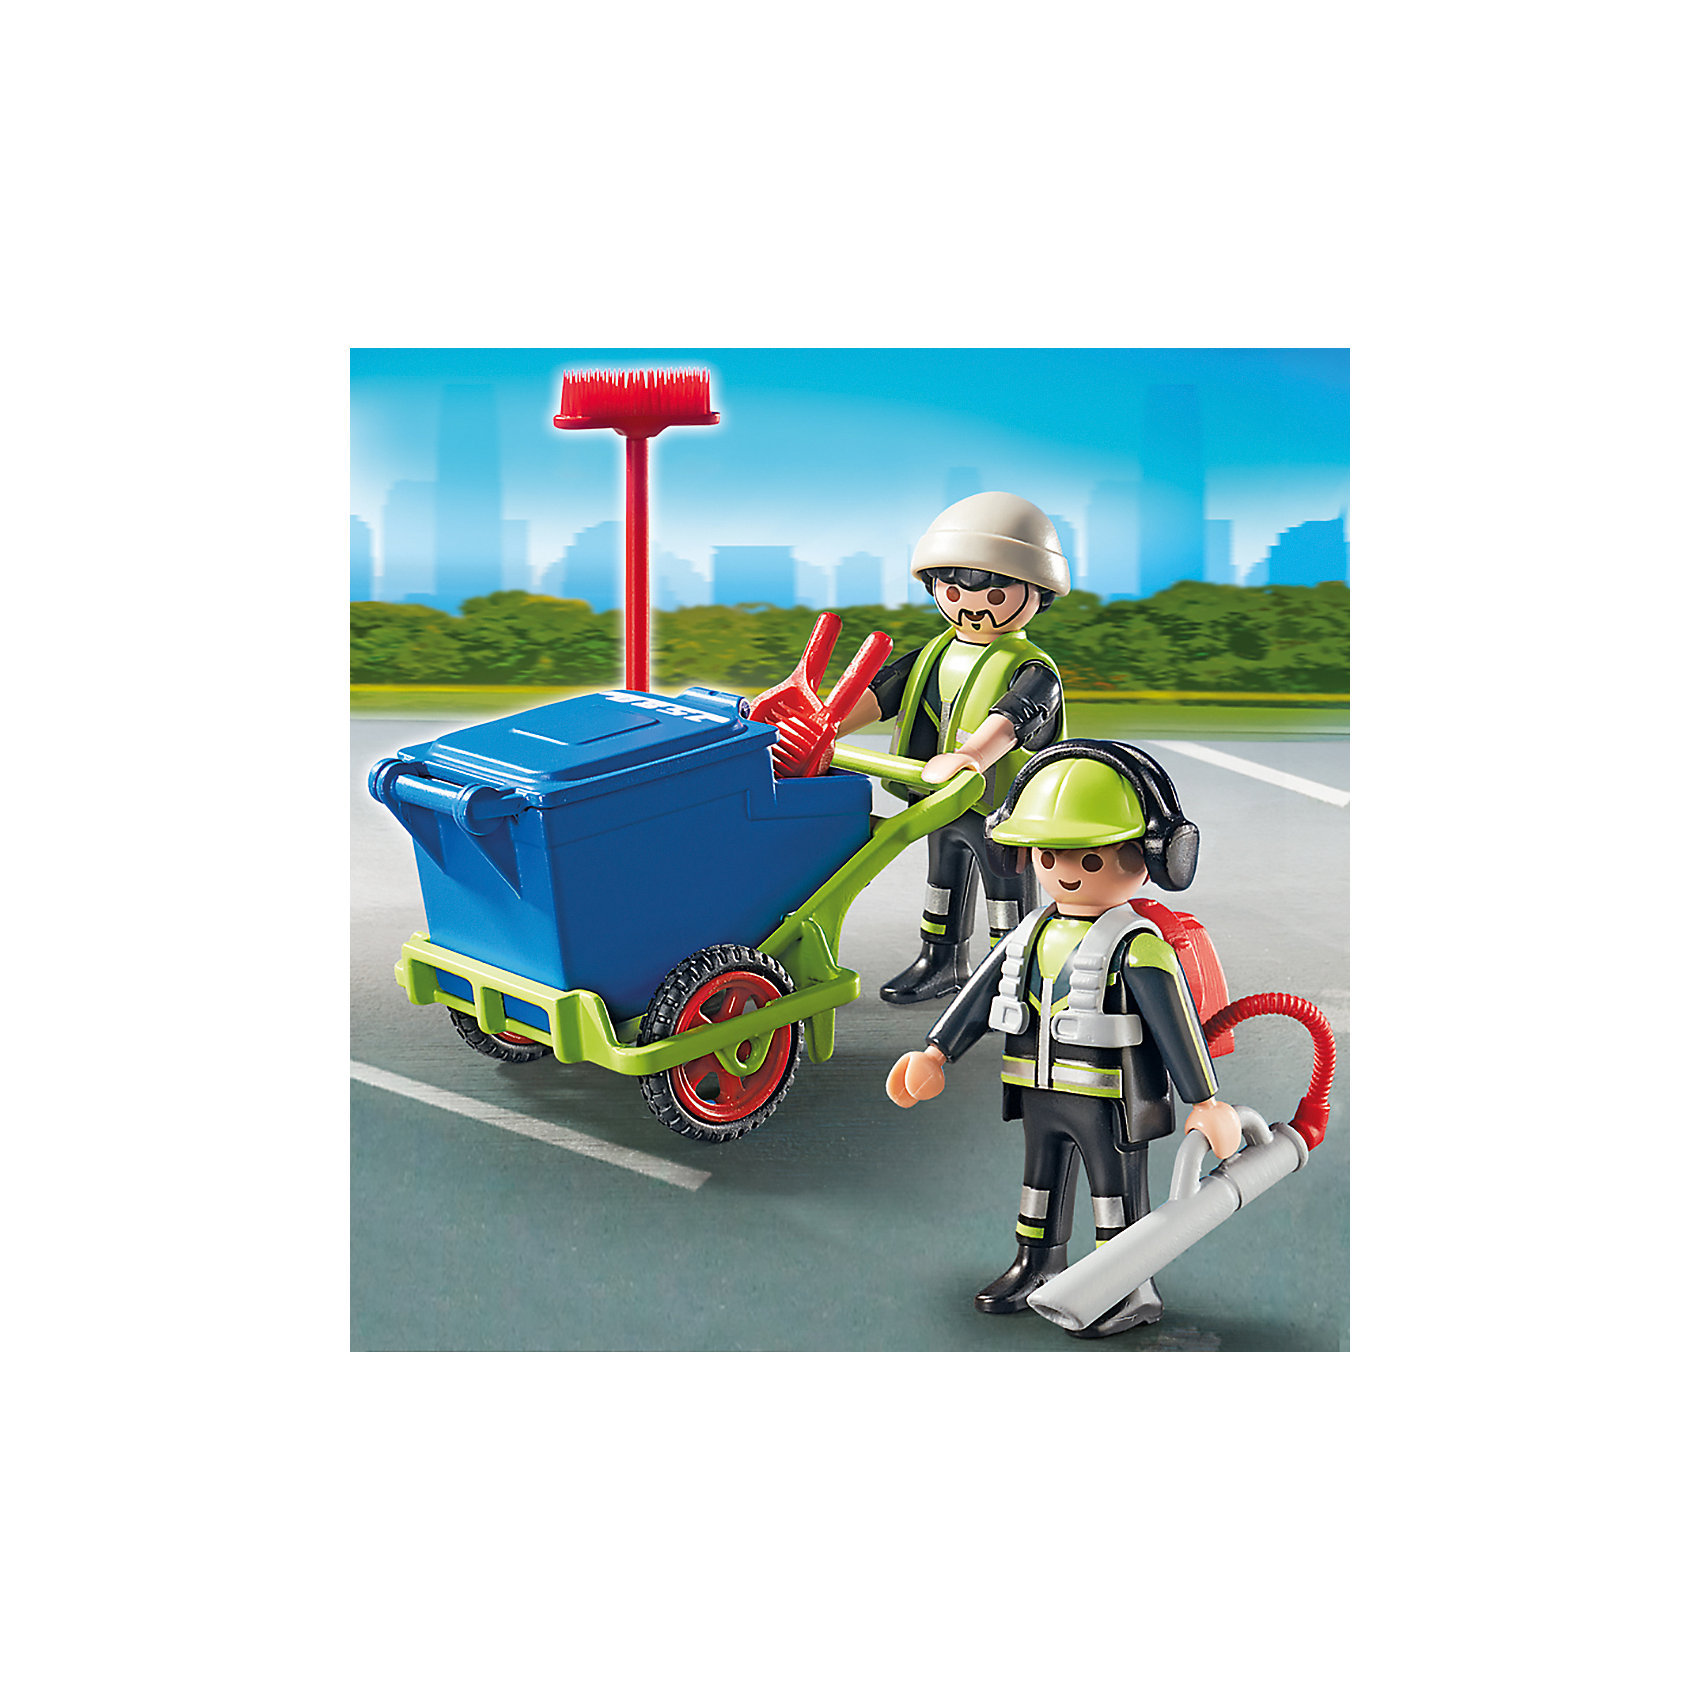 Городские службы: Команда по уборке улиц города, PLAYMOBIL<br><br>Ширина мм: 144<br>Глубина мм: 141<br>Высота мм: 46<br>Вес г: 100<br>Возраст от месяцев: 48<br>Возраст до месяцев: 120<br>Пол: Мужской<br>Возраст: Детский<br>SKU: 3786350